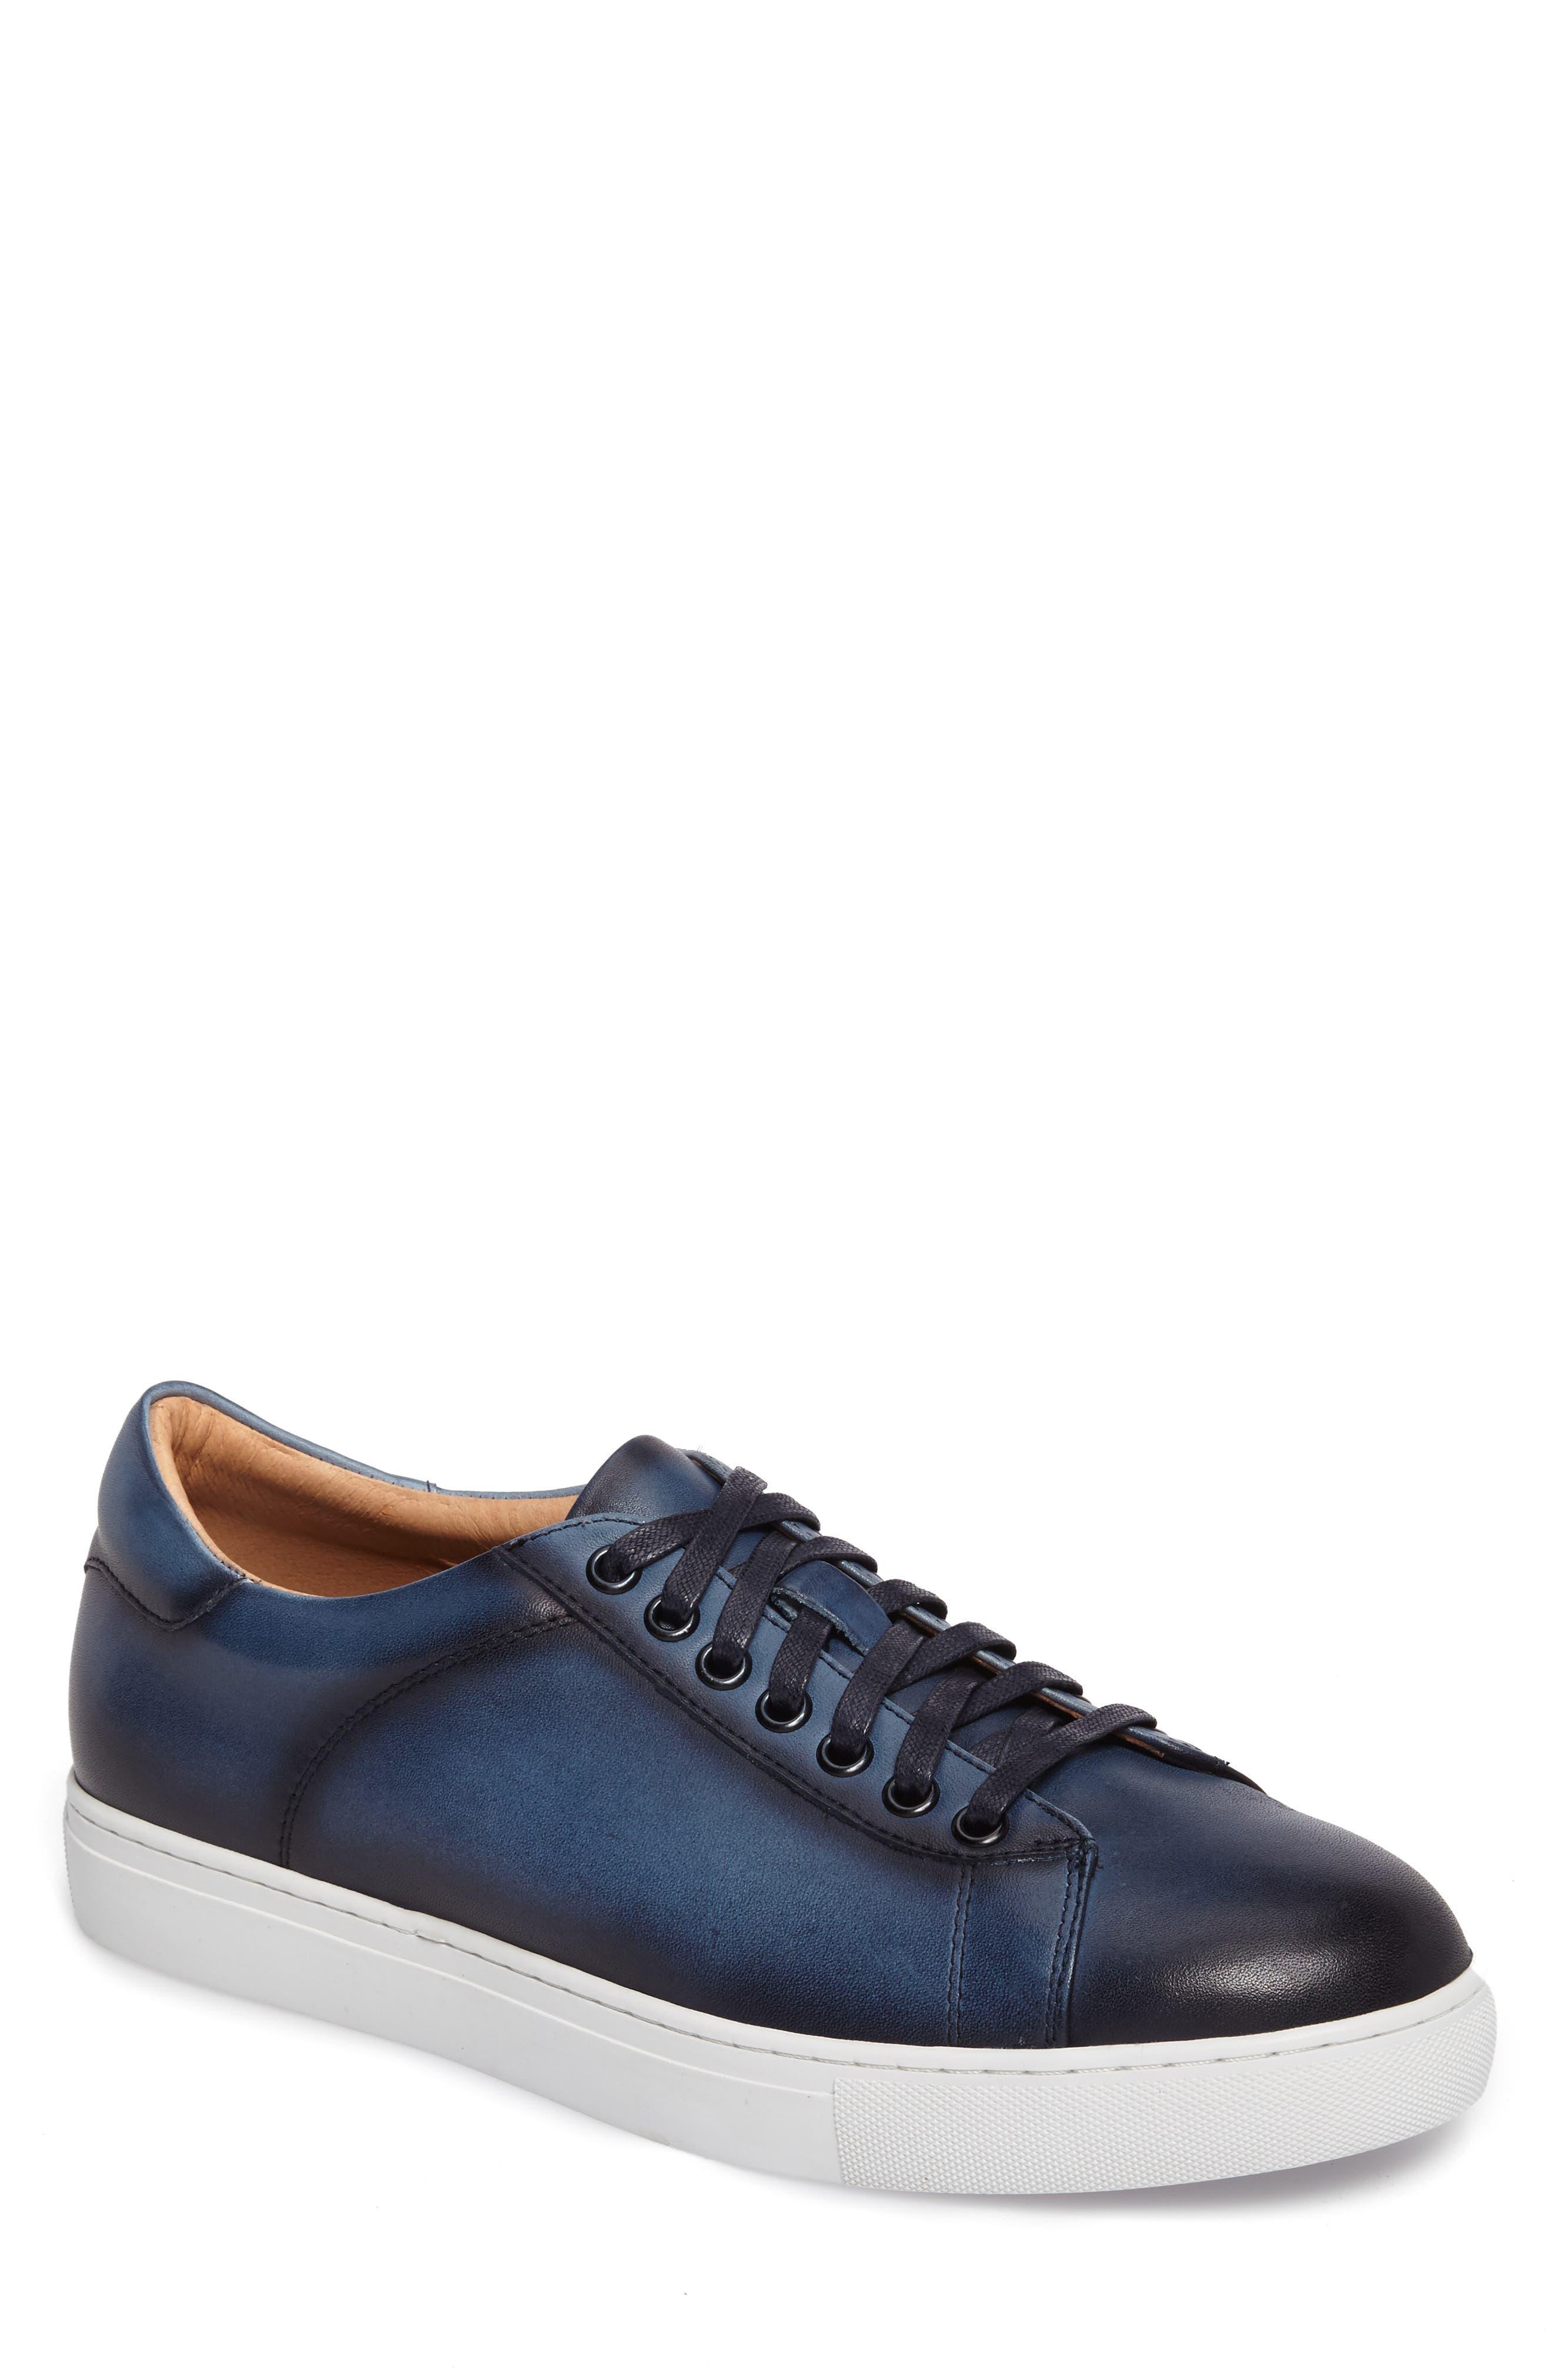 Penrose Sneaker,                             Main thumbnail 1, color,                             Blue Leather